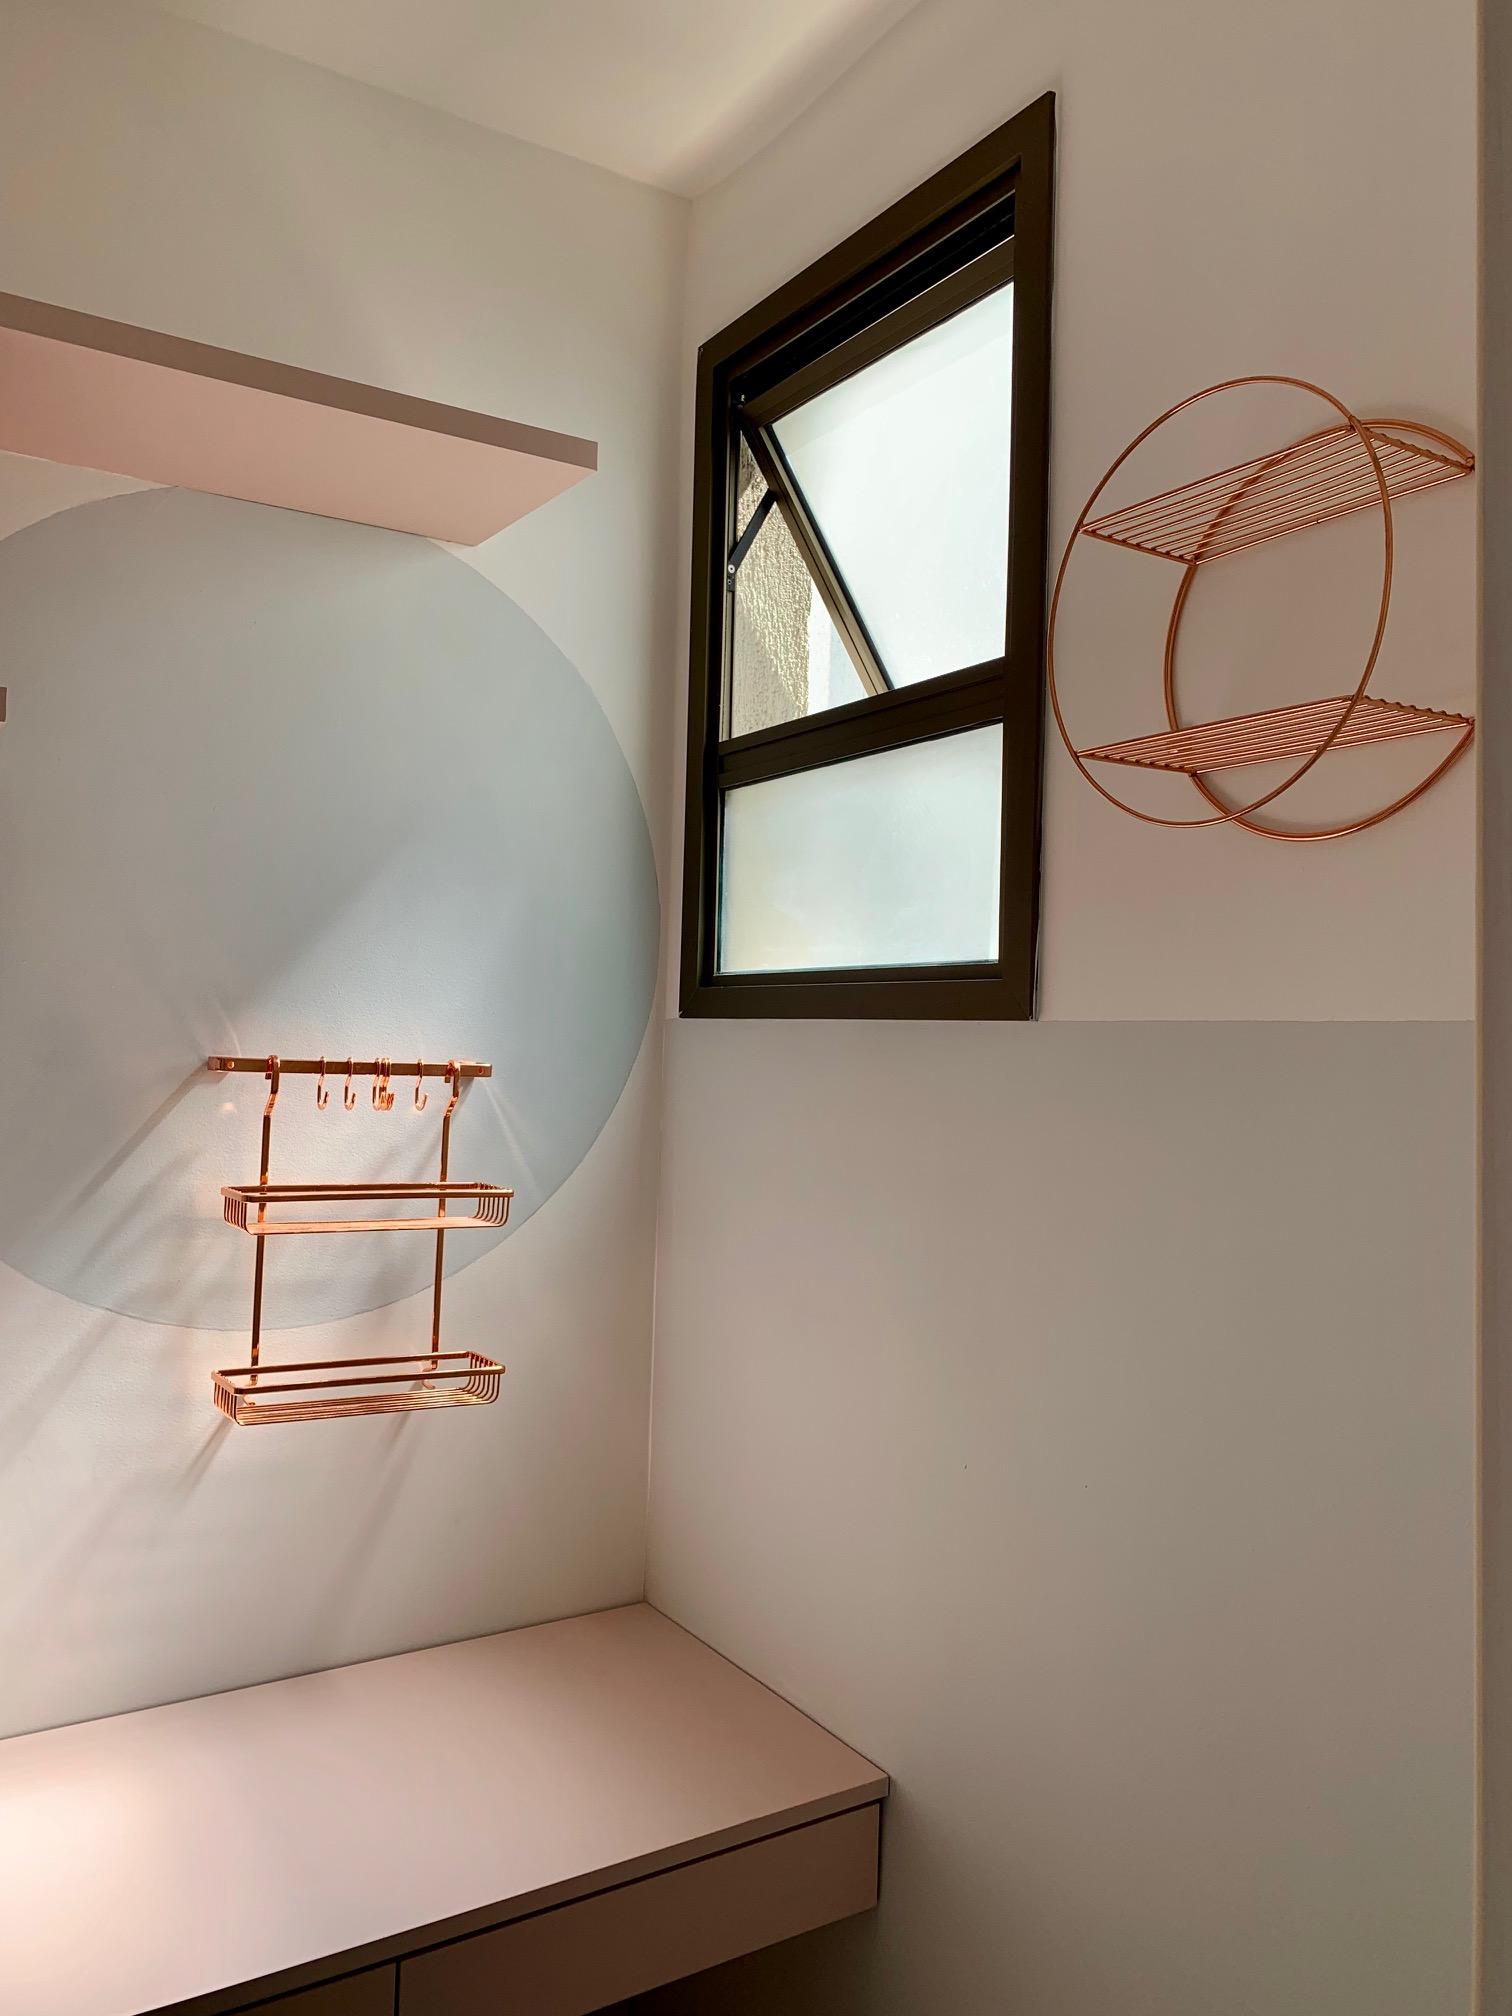 Como decorar: o segredo das escolhas décor harmoniosas.